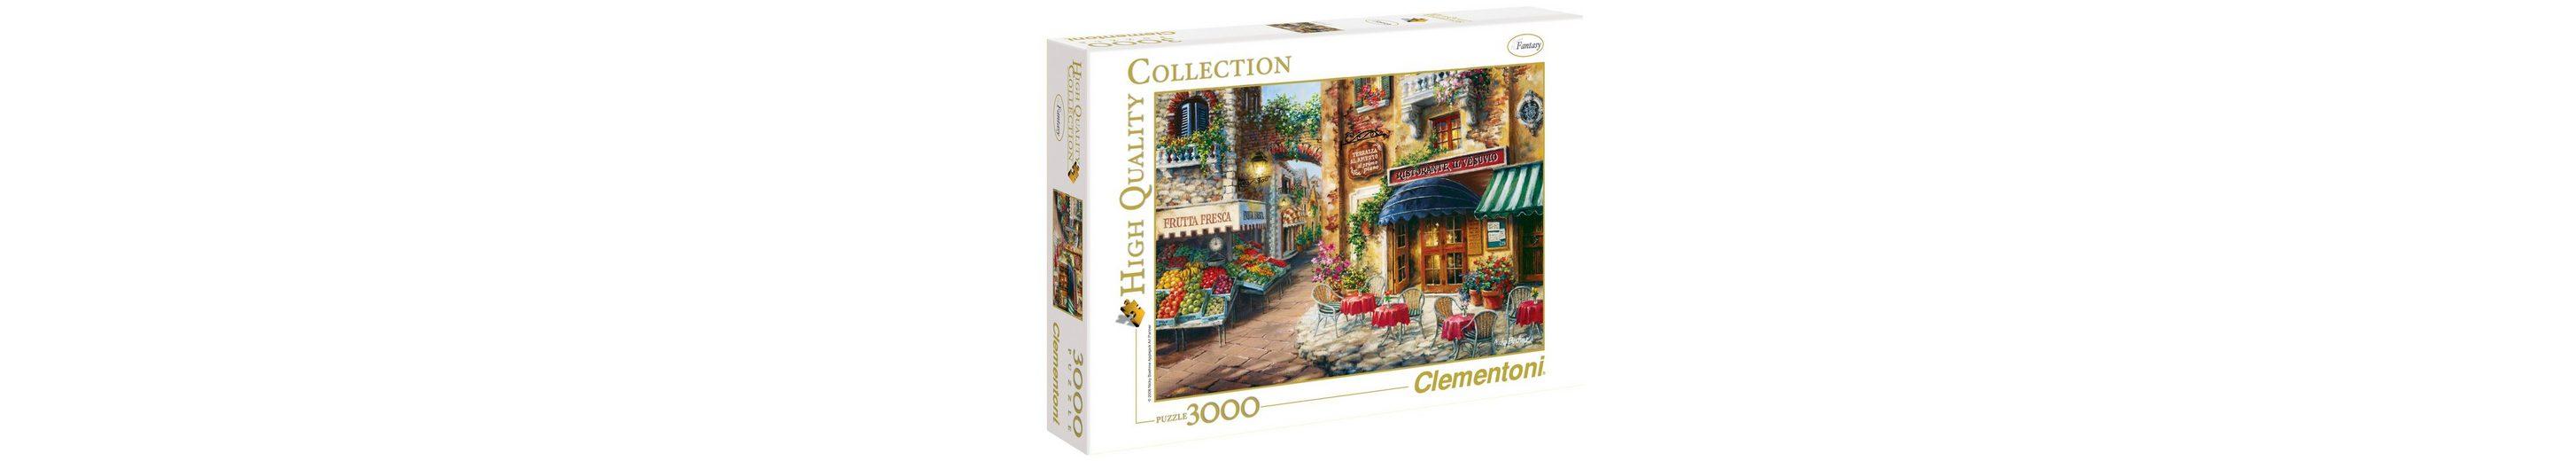 Clementoni Puzzle, 3000 Teile, »Buon appetito!«